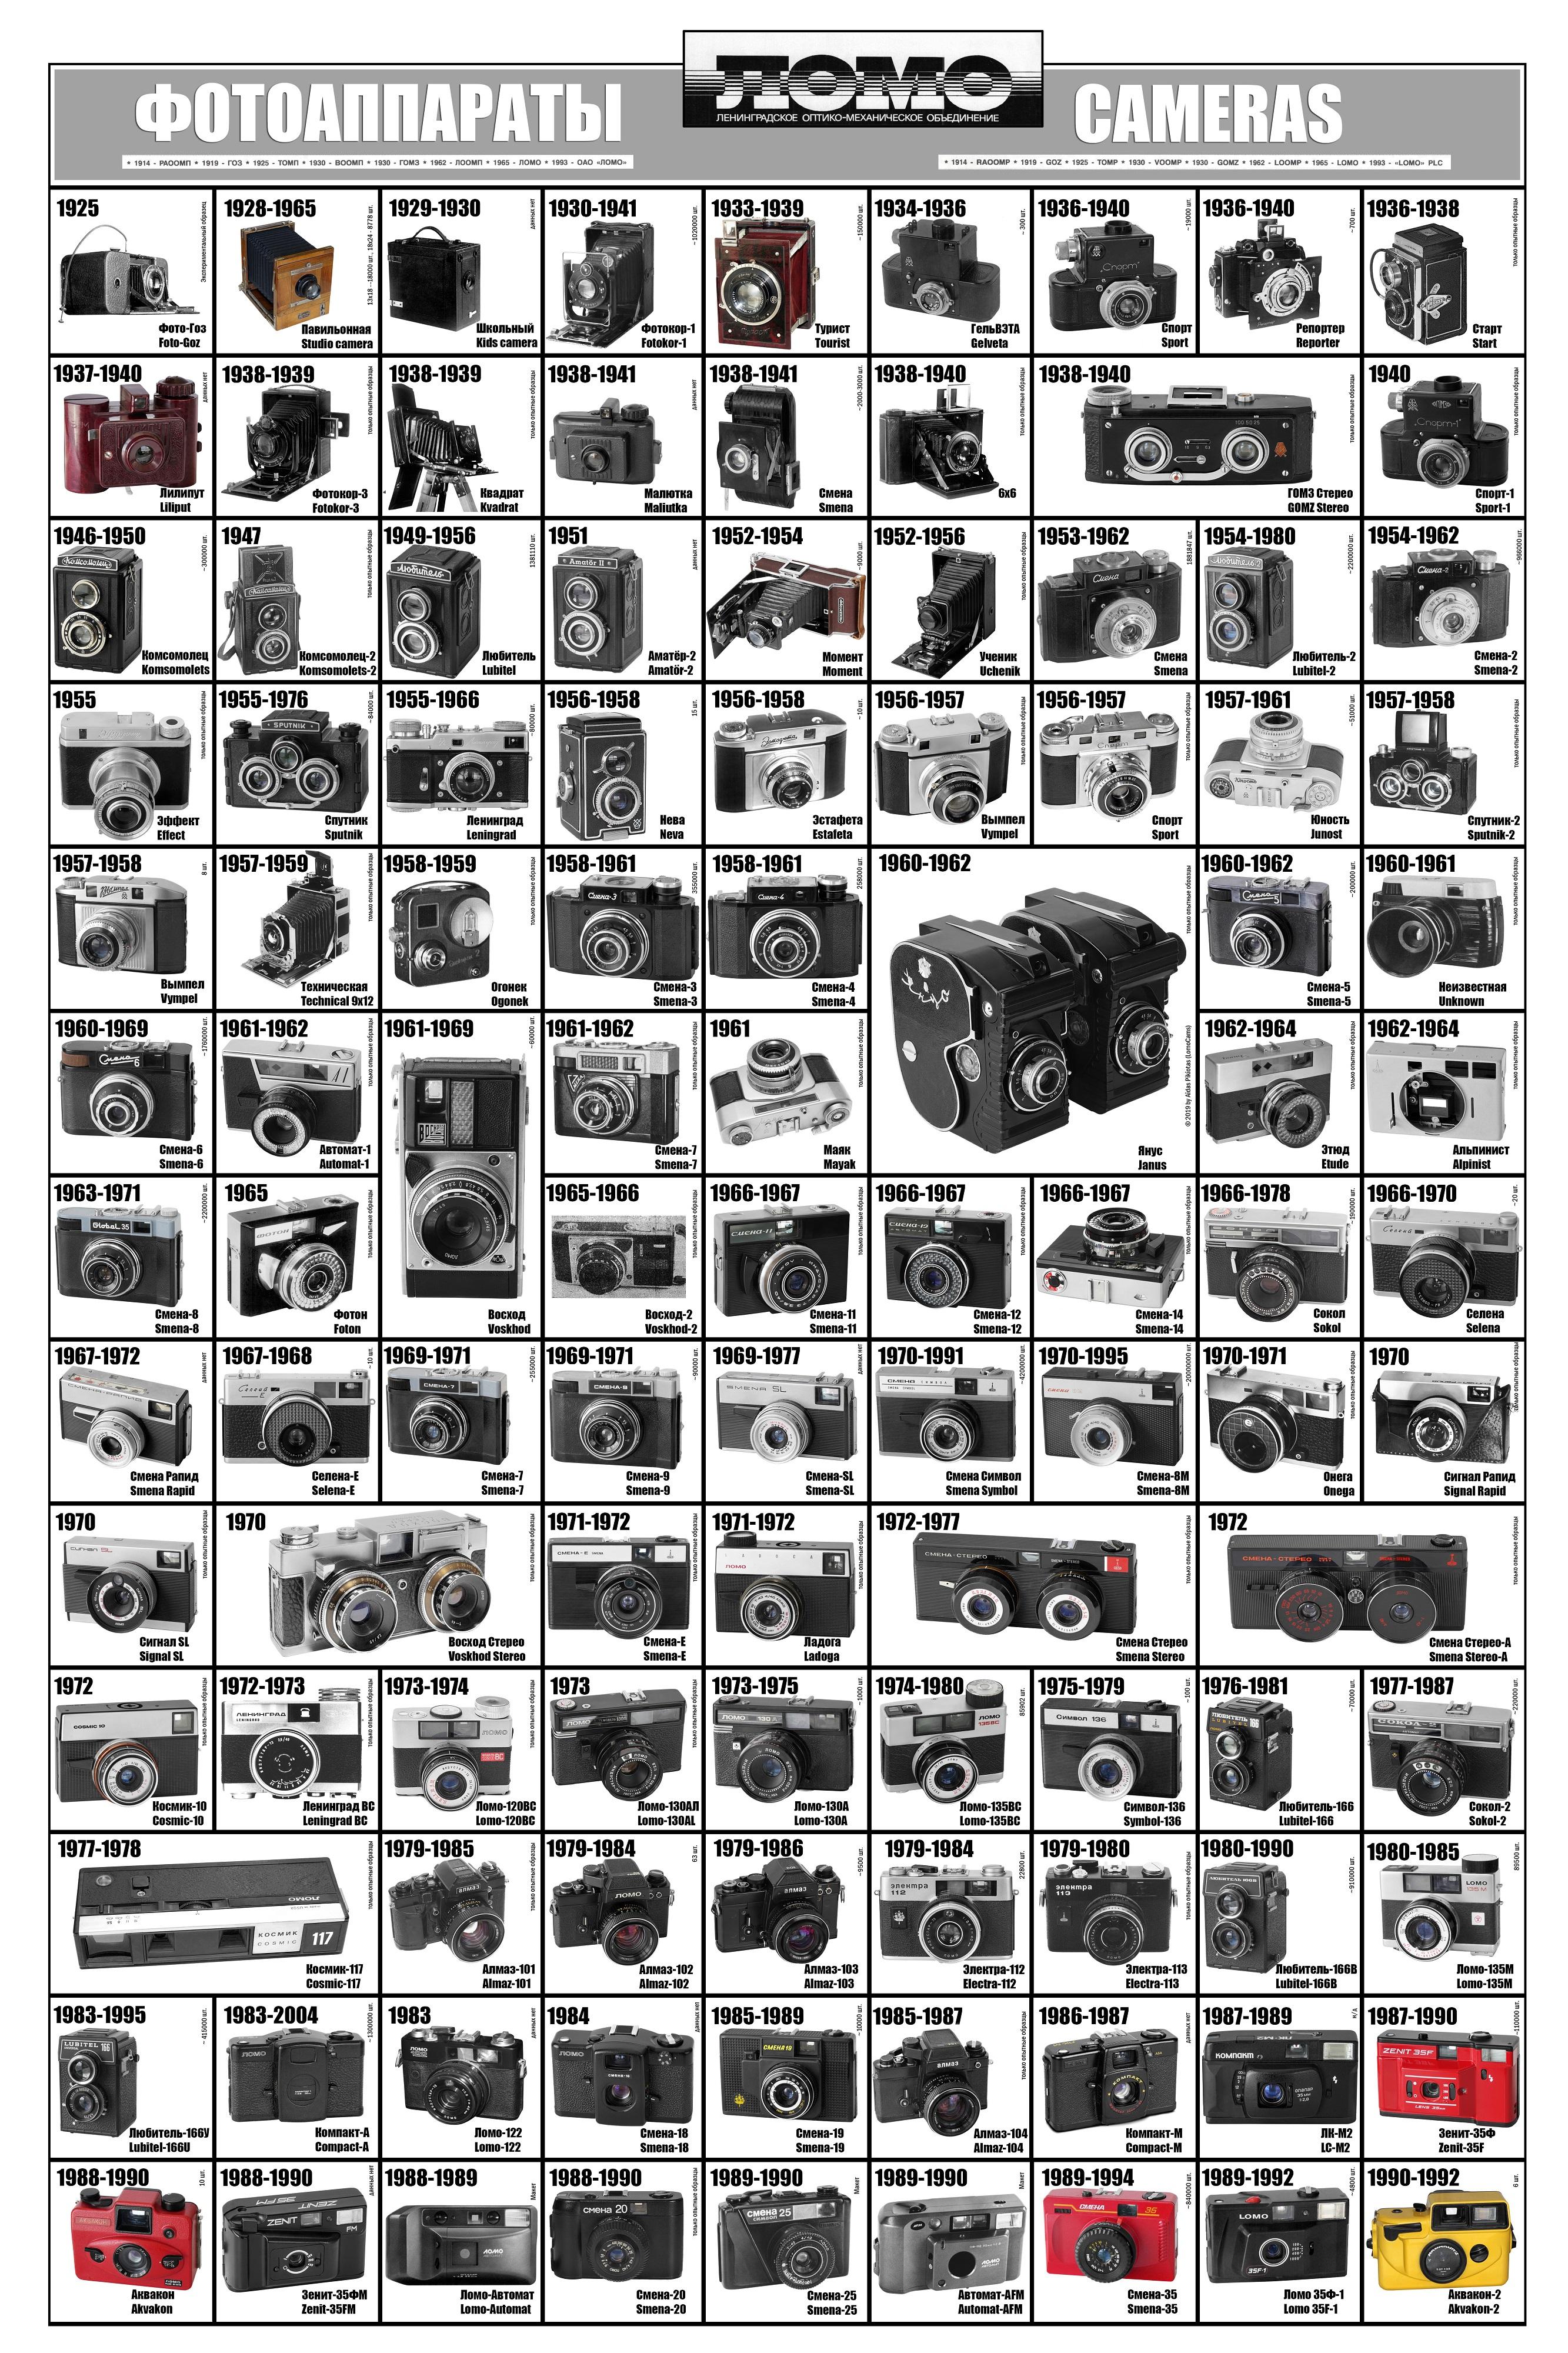 Lomo Camera poster (Pic: Aidas Pikiotas)